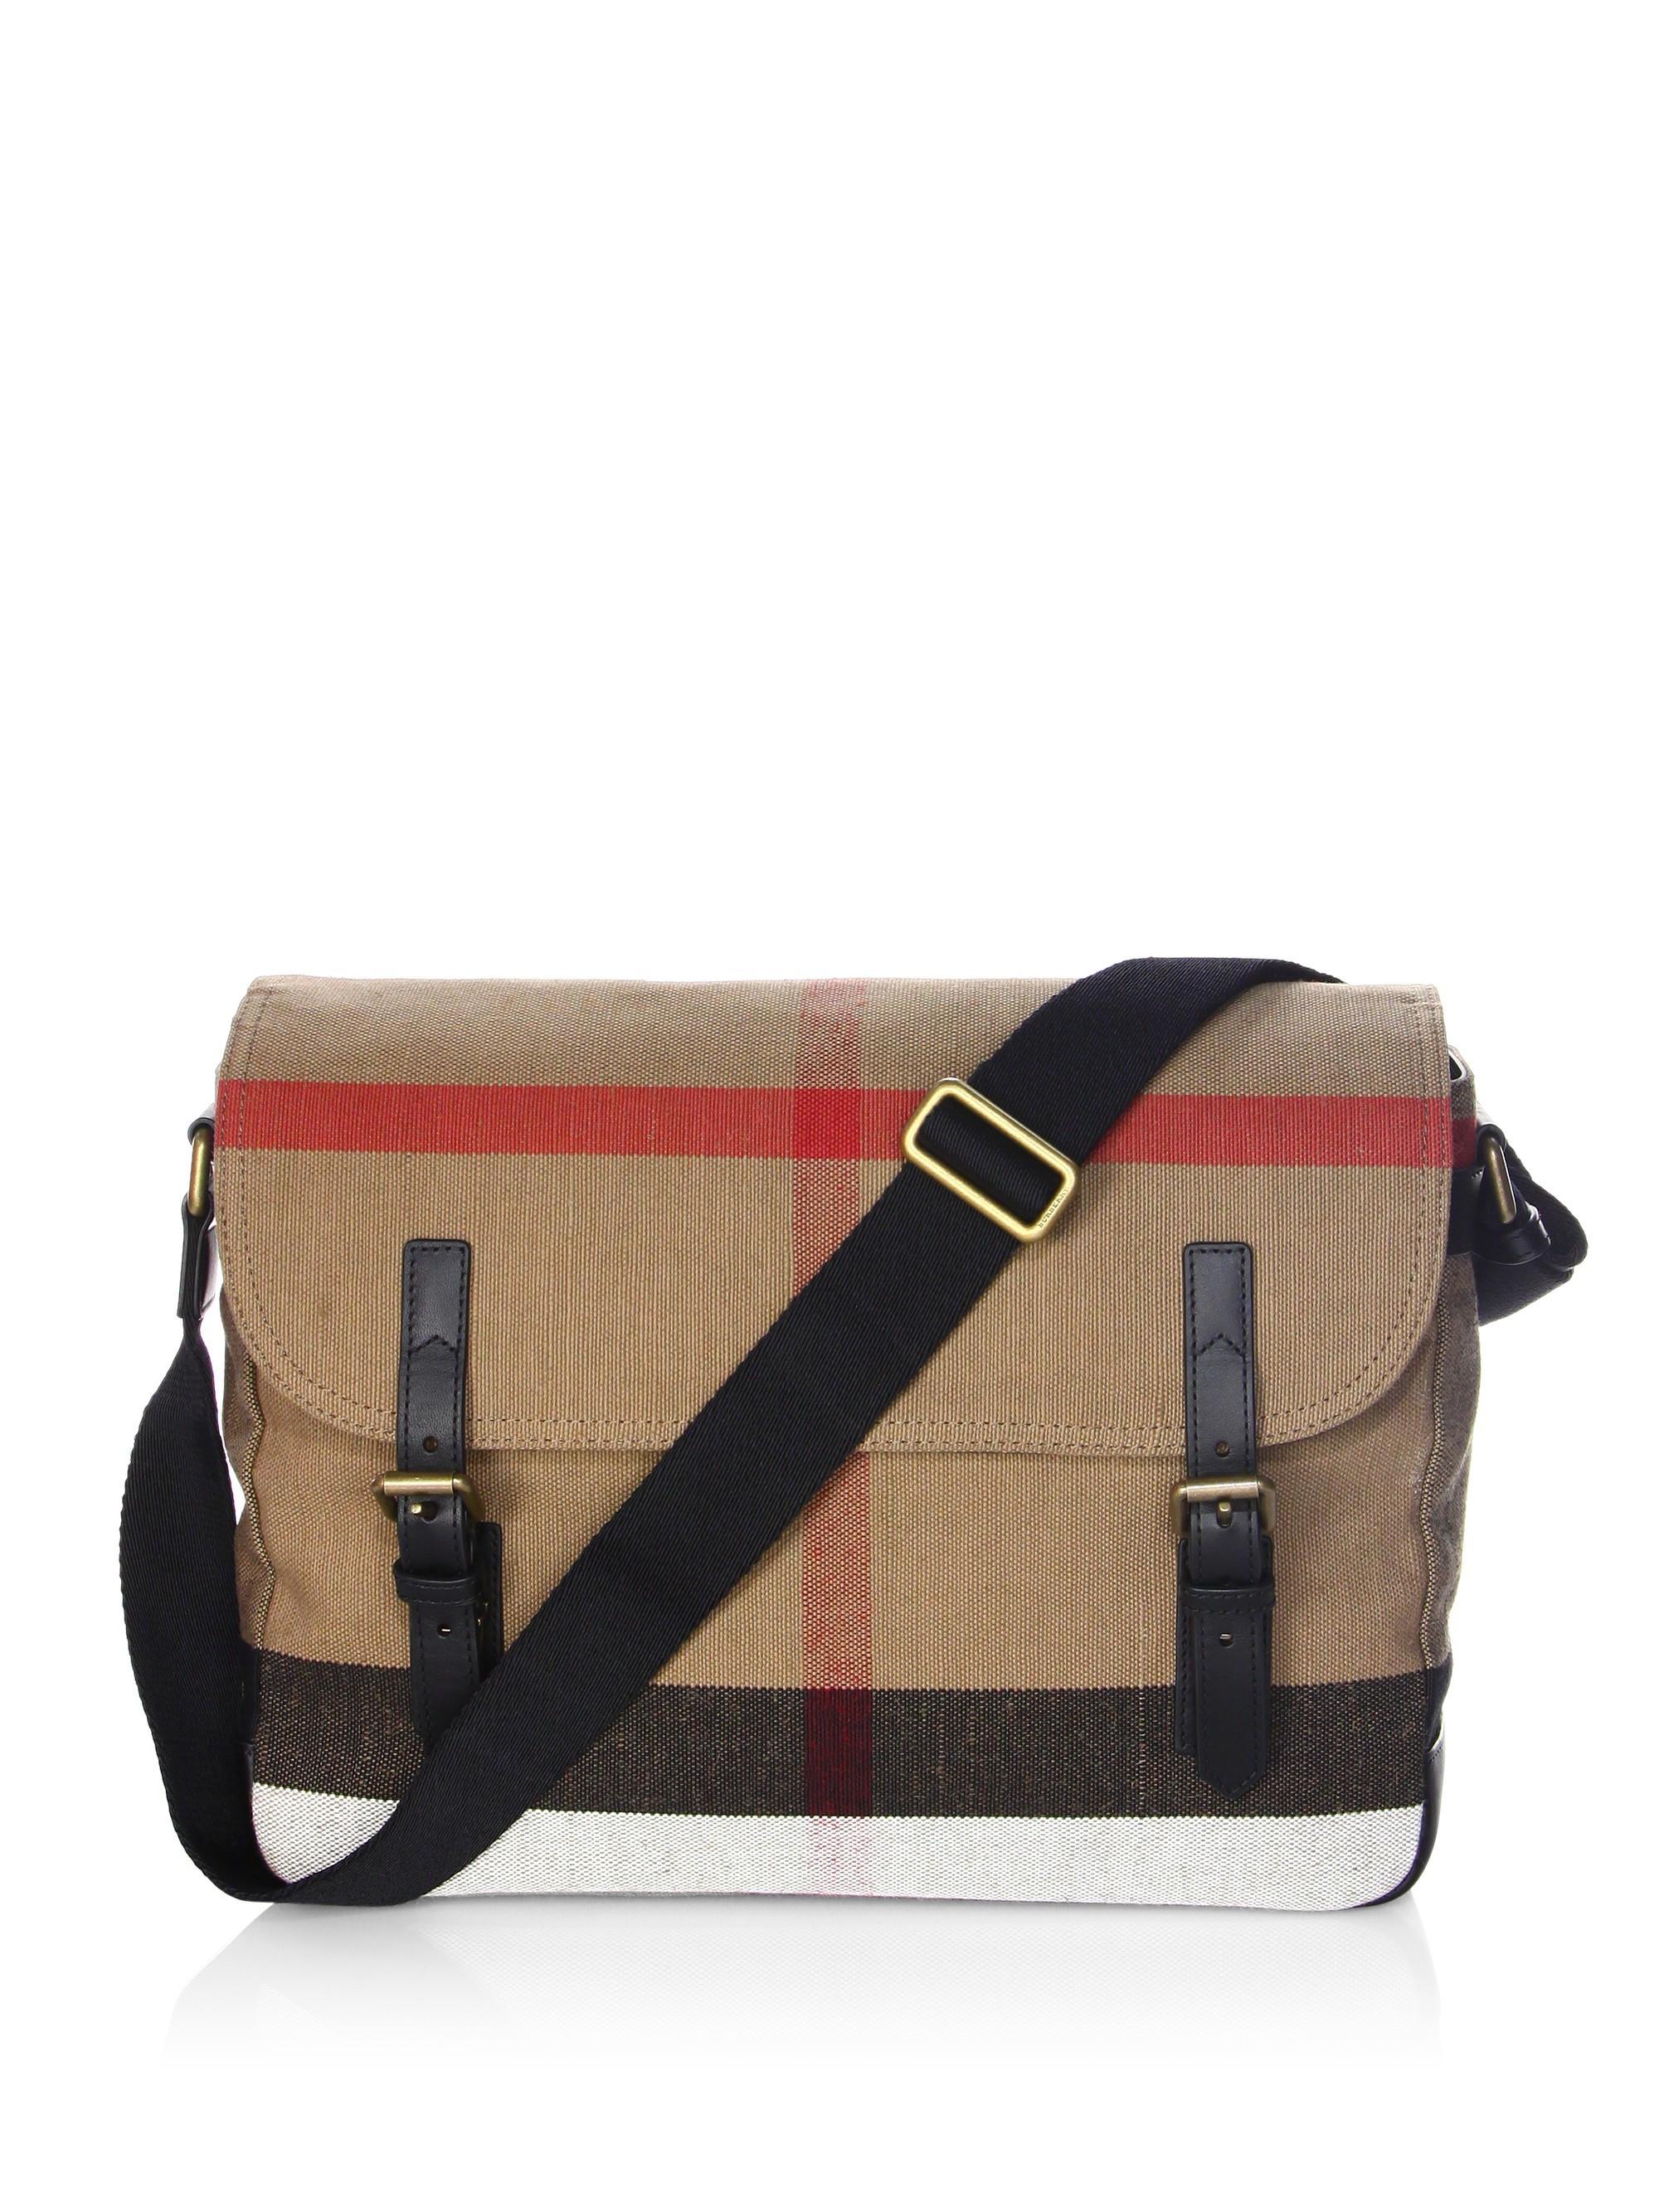 BURBERRY Check Cotton Canvas Messenger Bag in Black